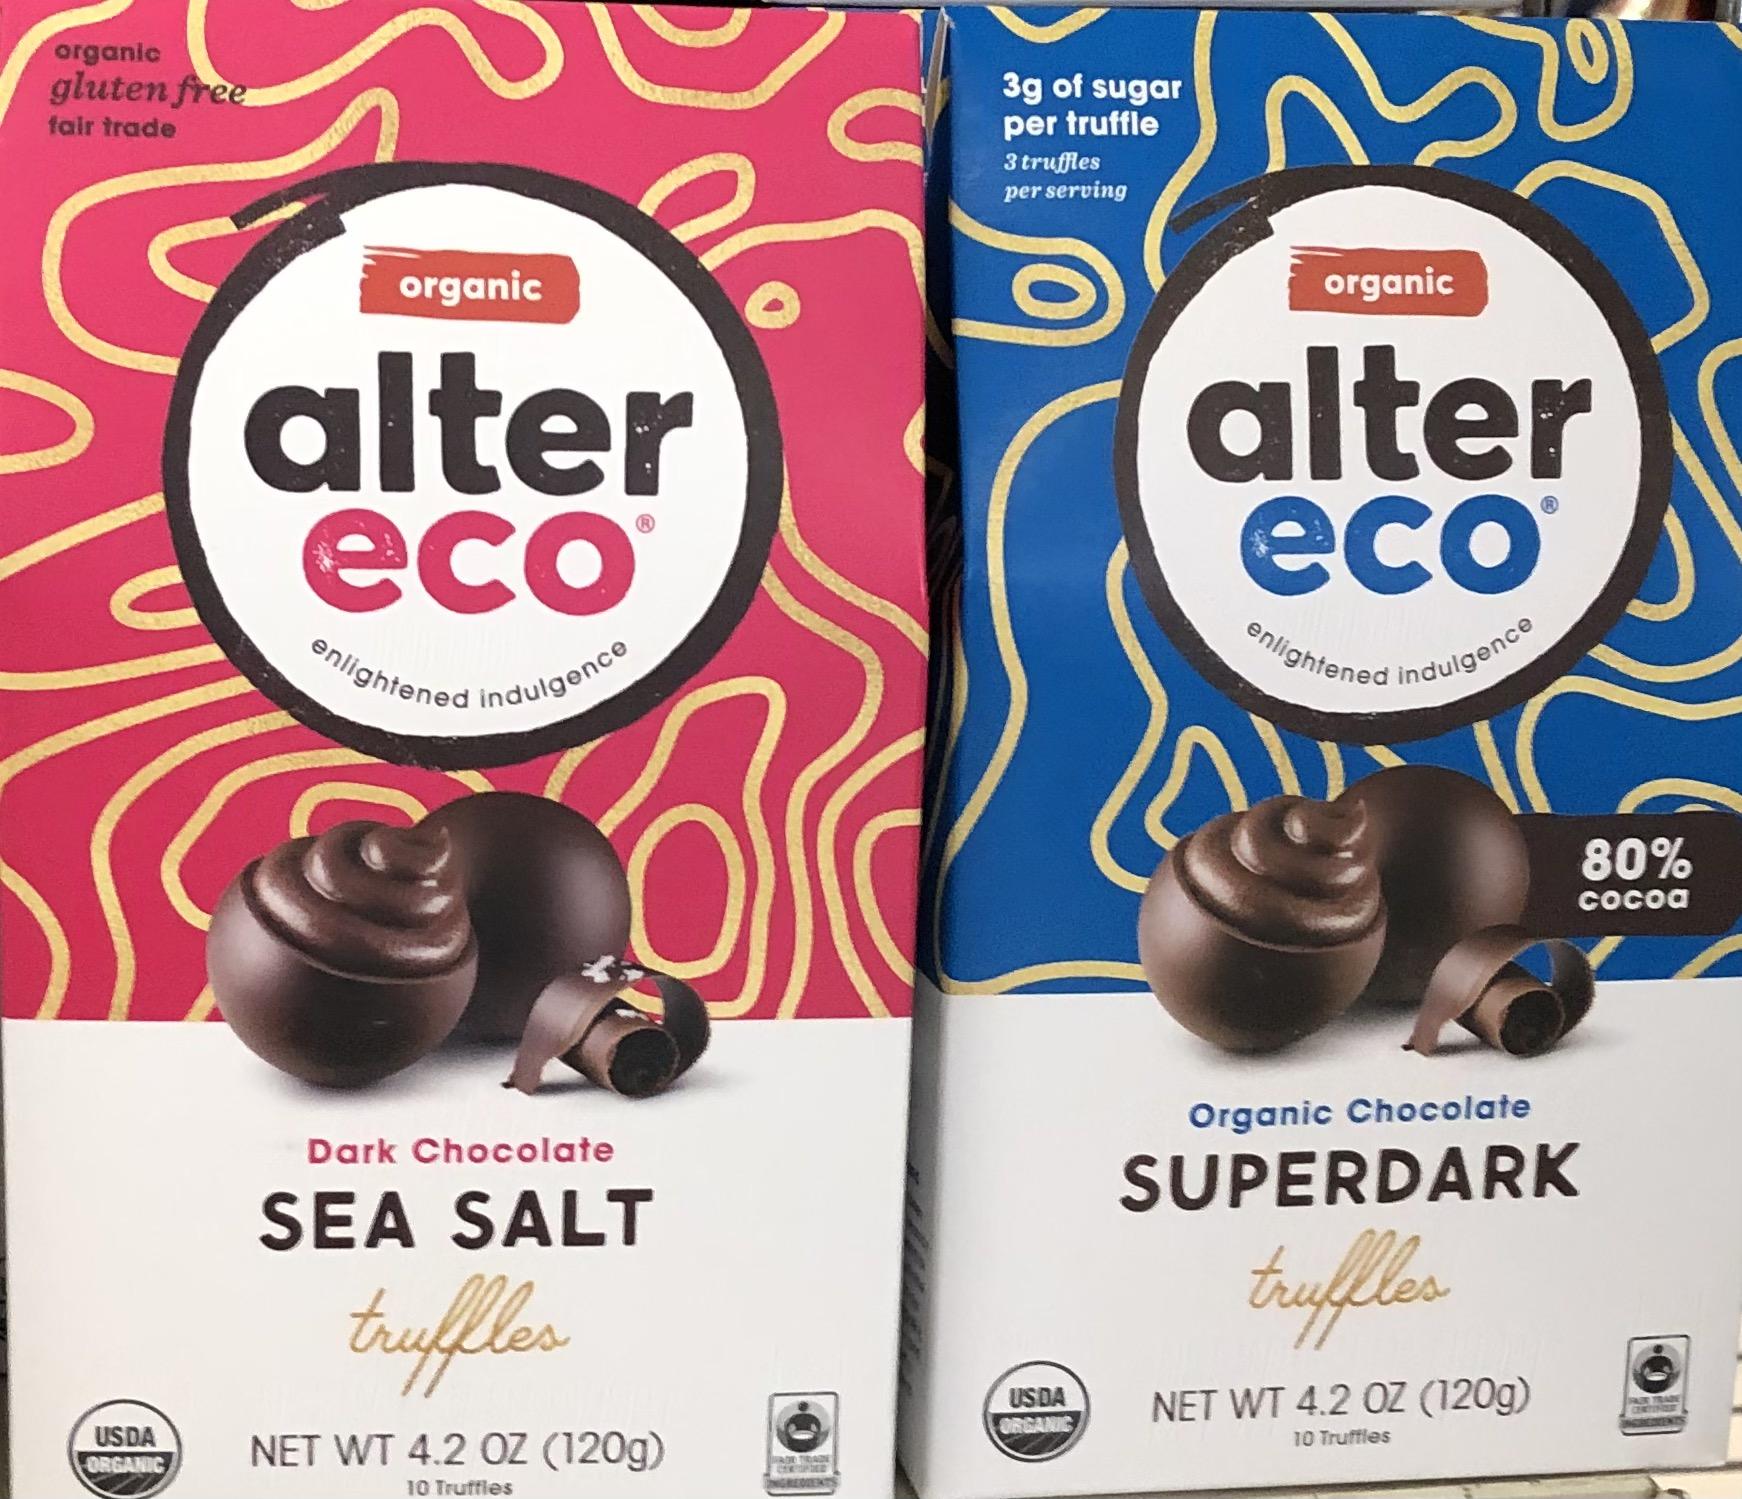 Photo: Fair Trade AlterEco chocolate.